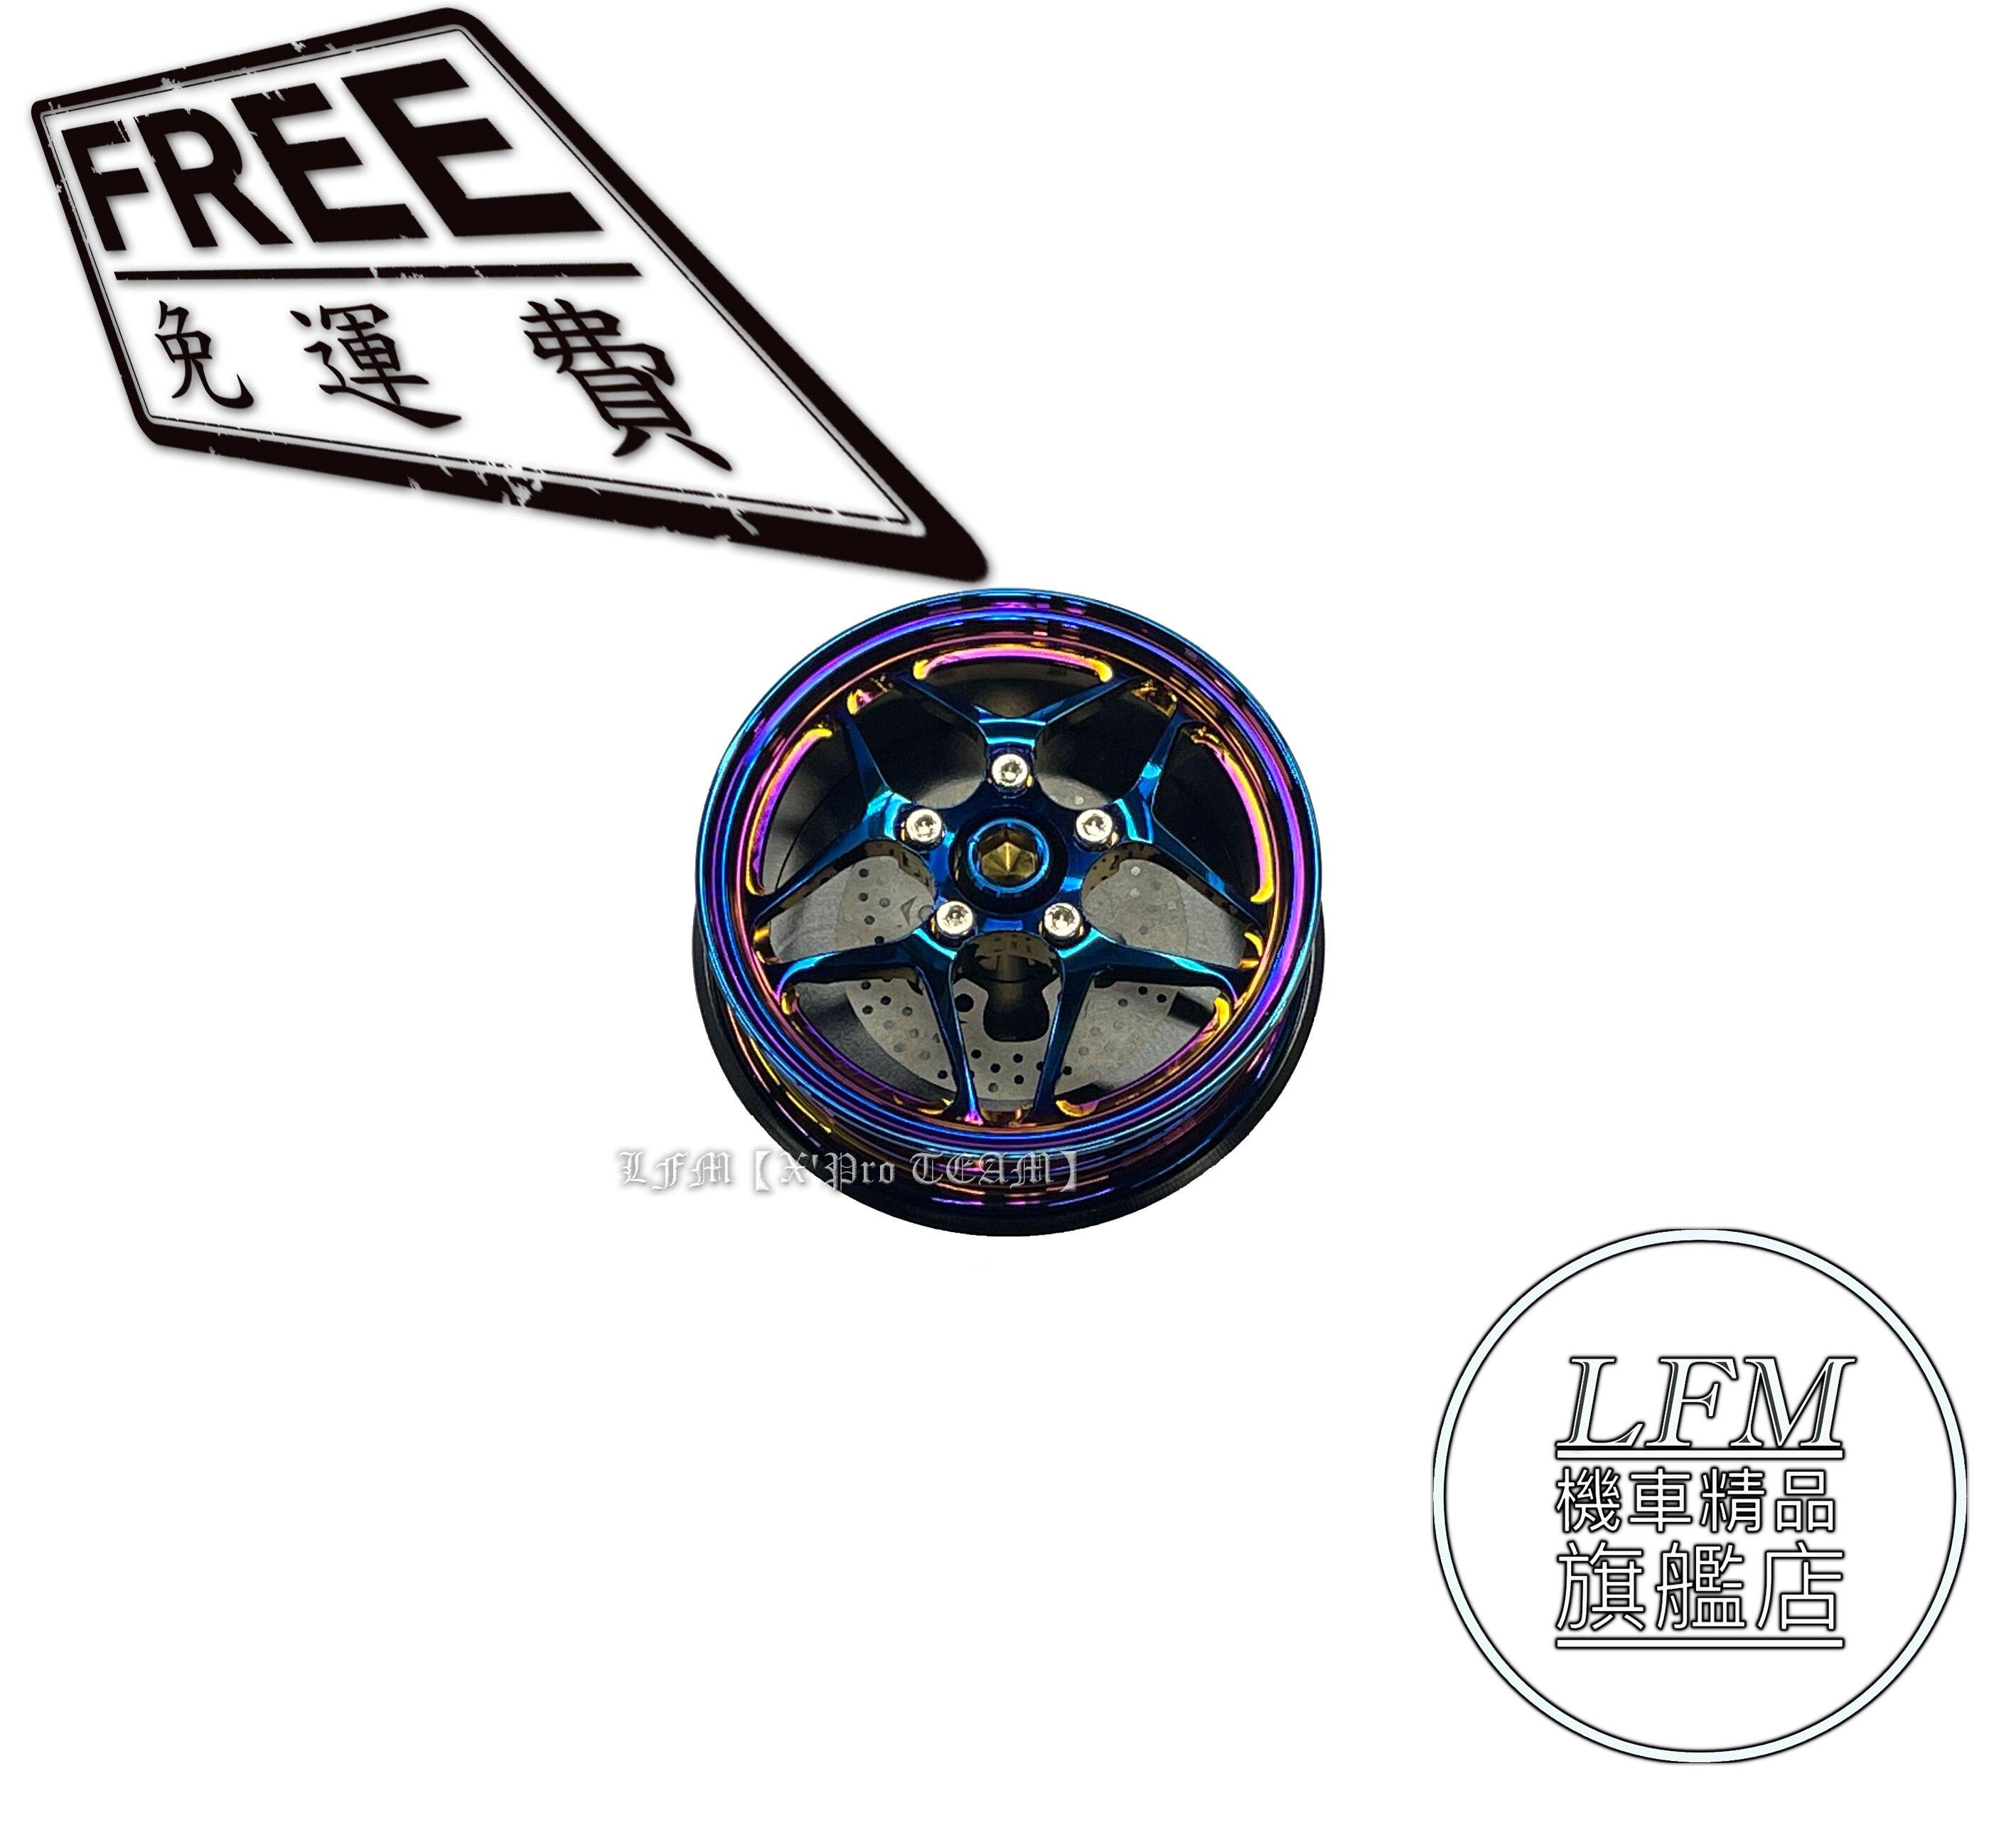 【LFM】免運費 APEXX 山葉 輪框造型 油箱蓋 燒鈦 勁戰六代 SMAX FORCE 勁戰五代 BWS LIMI